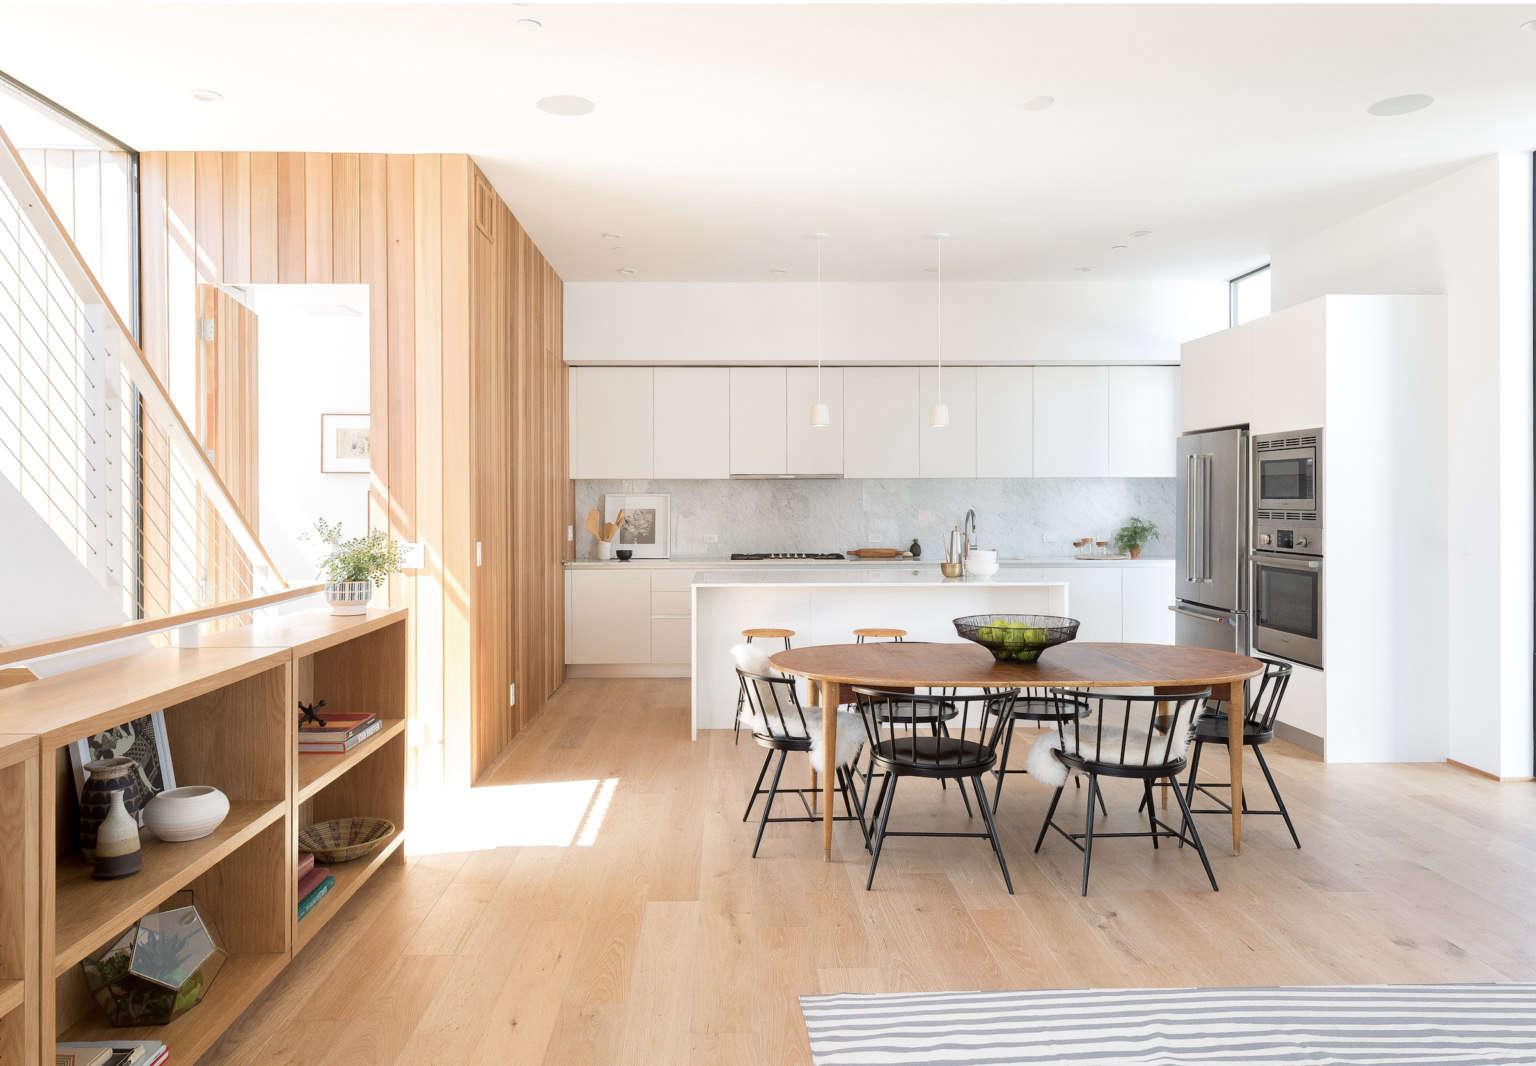 habitat 6 integrated development kitchen 1536x1066